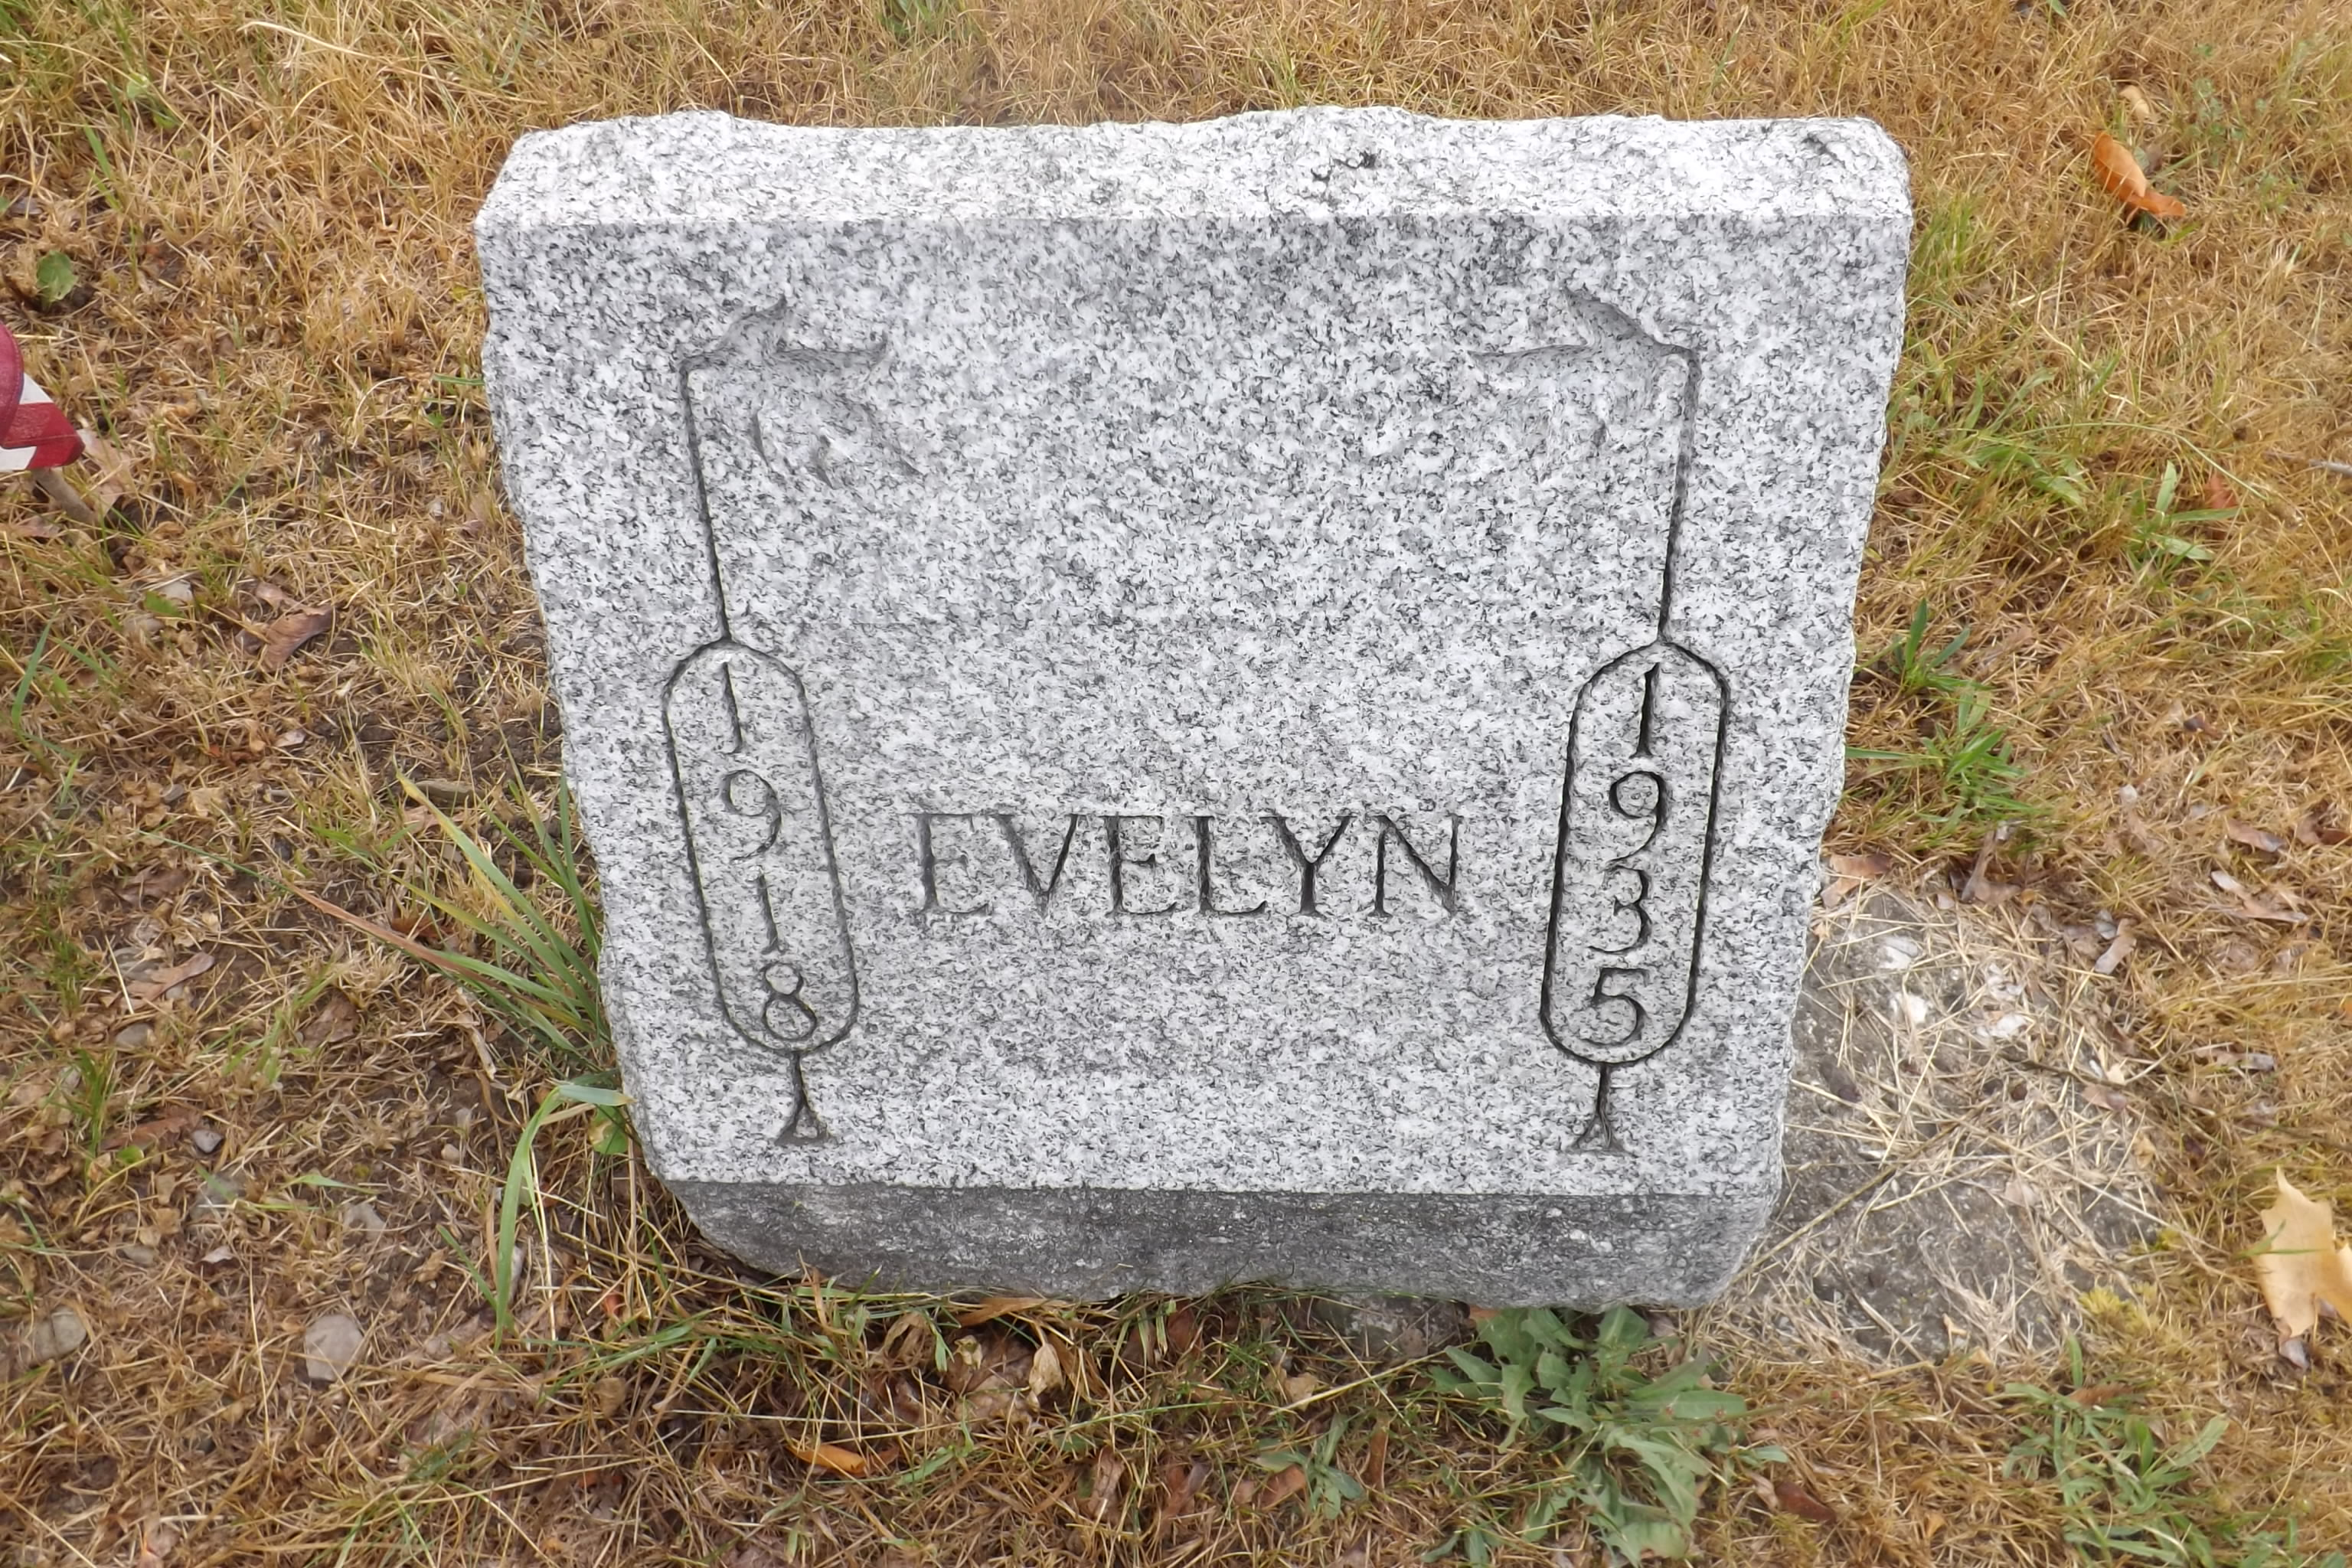 Evelyn Allington